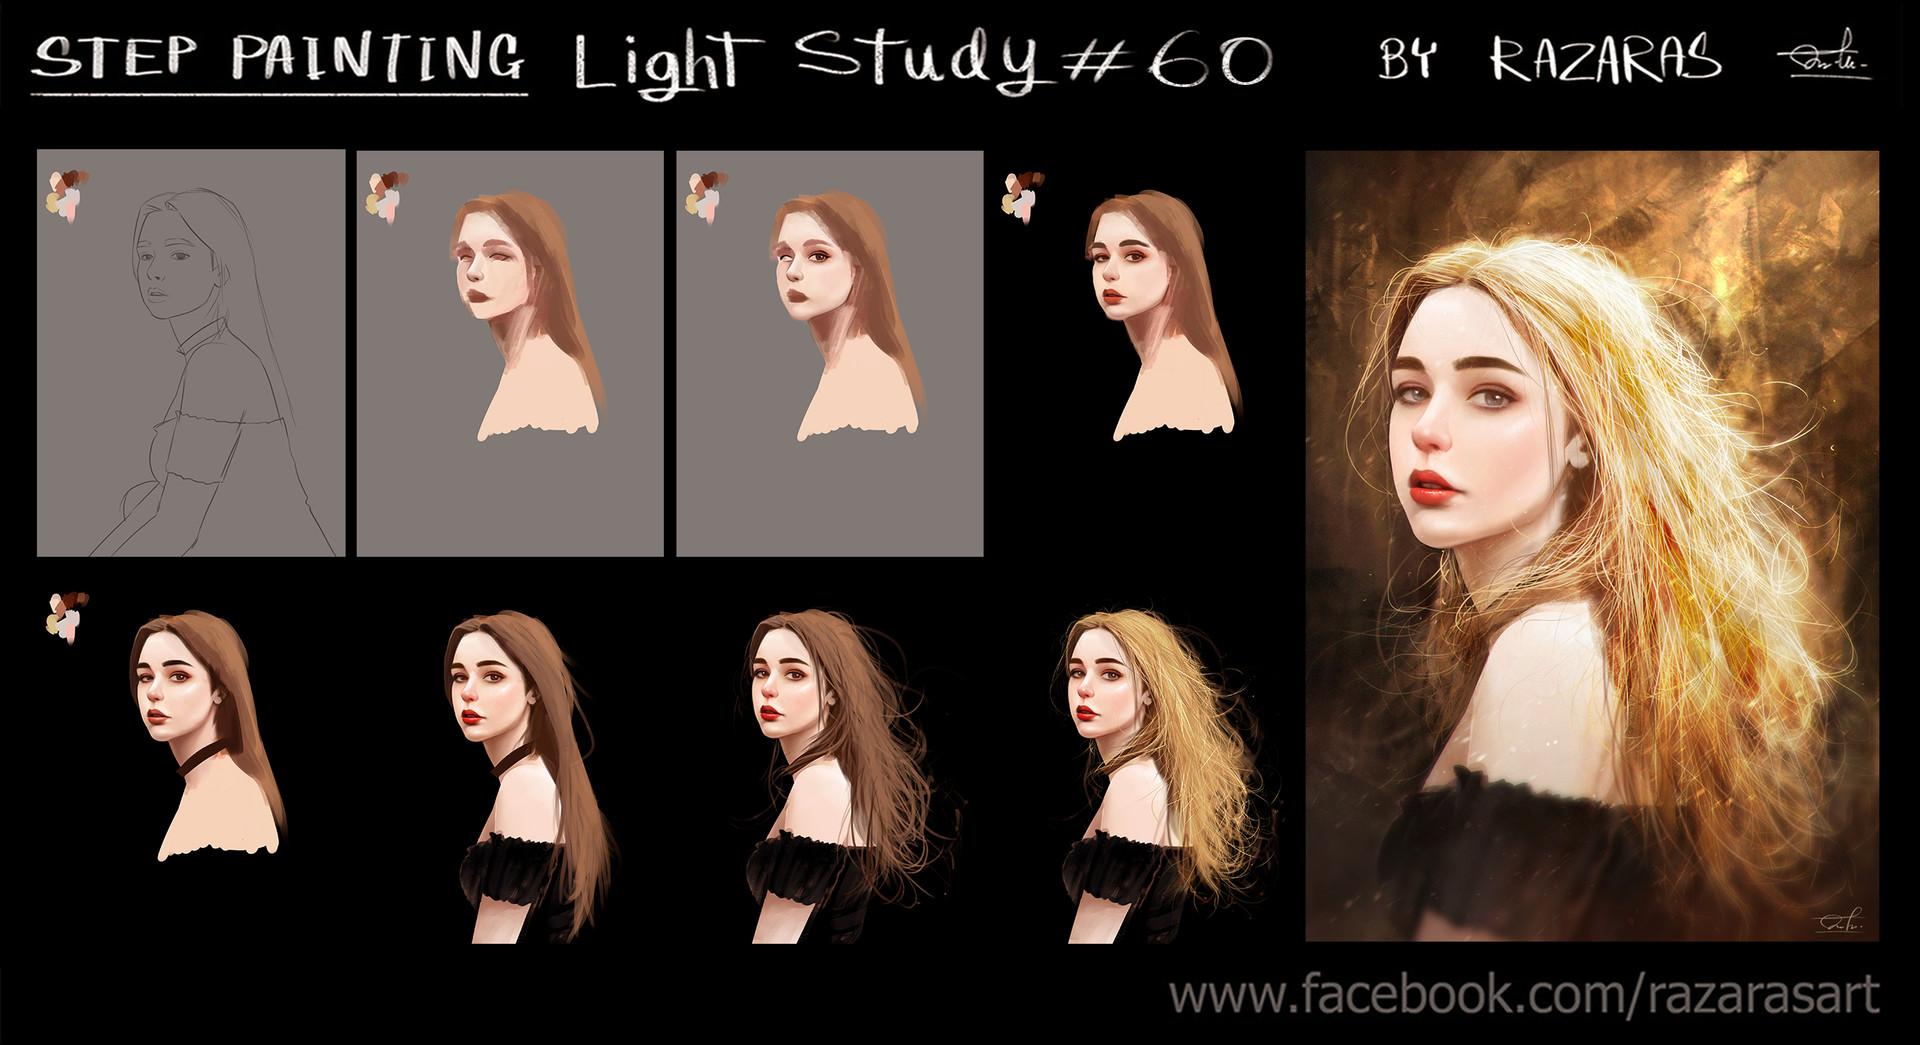 Kittichai reaungchaichan how to light 60